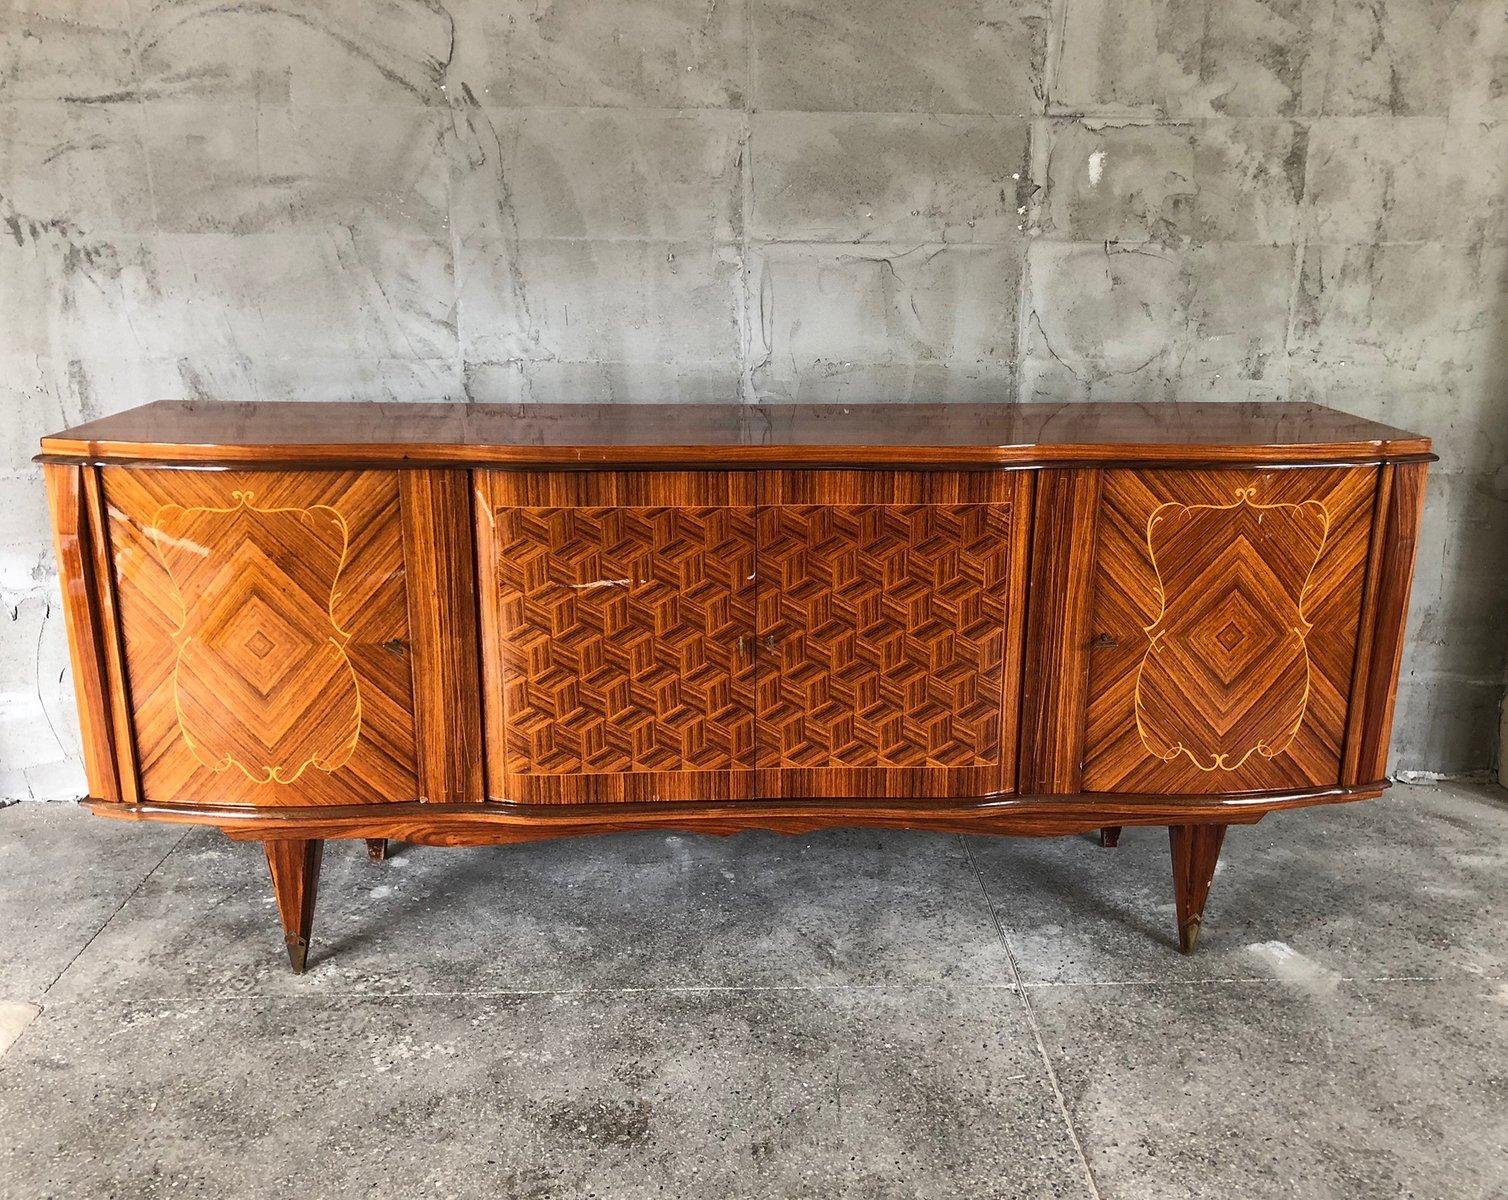 art deco sideboard aus palisander 1940er bei pamono kaufen. Black Bedroom Furniture Sets. Home Design Ideas